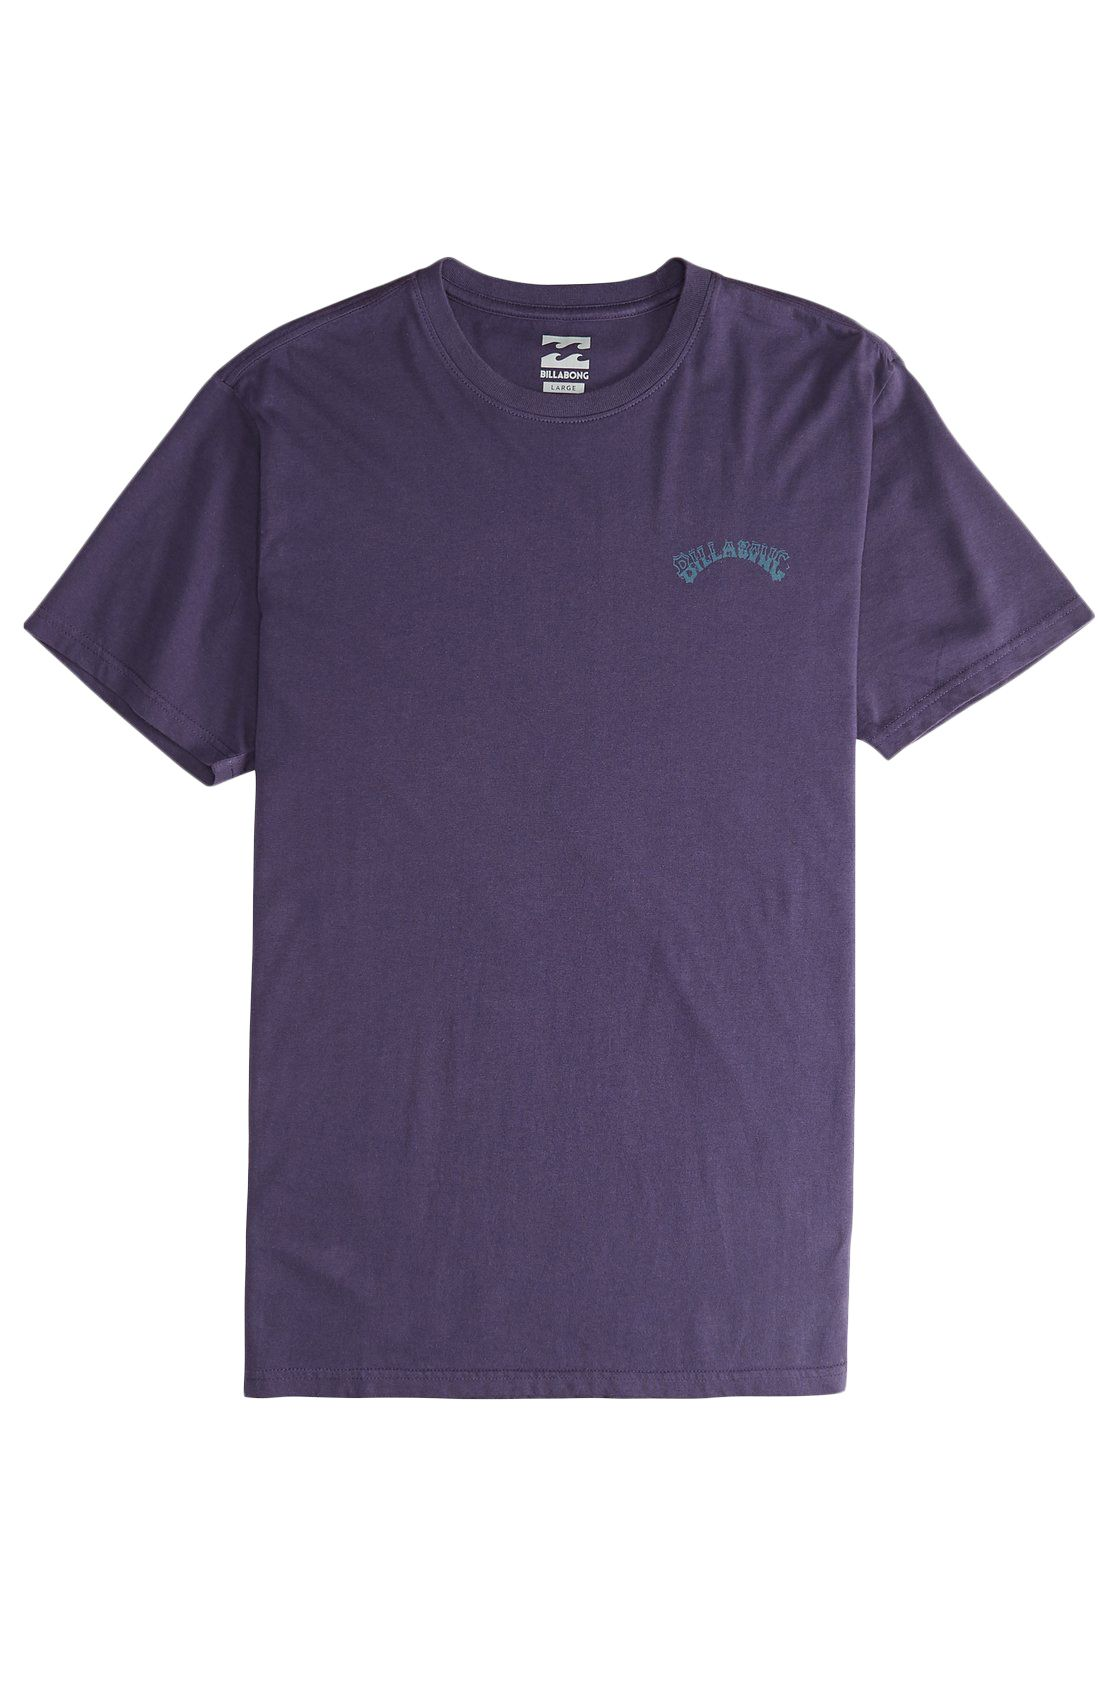 T-Shirt Billabong ICONIC Purp